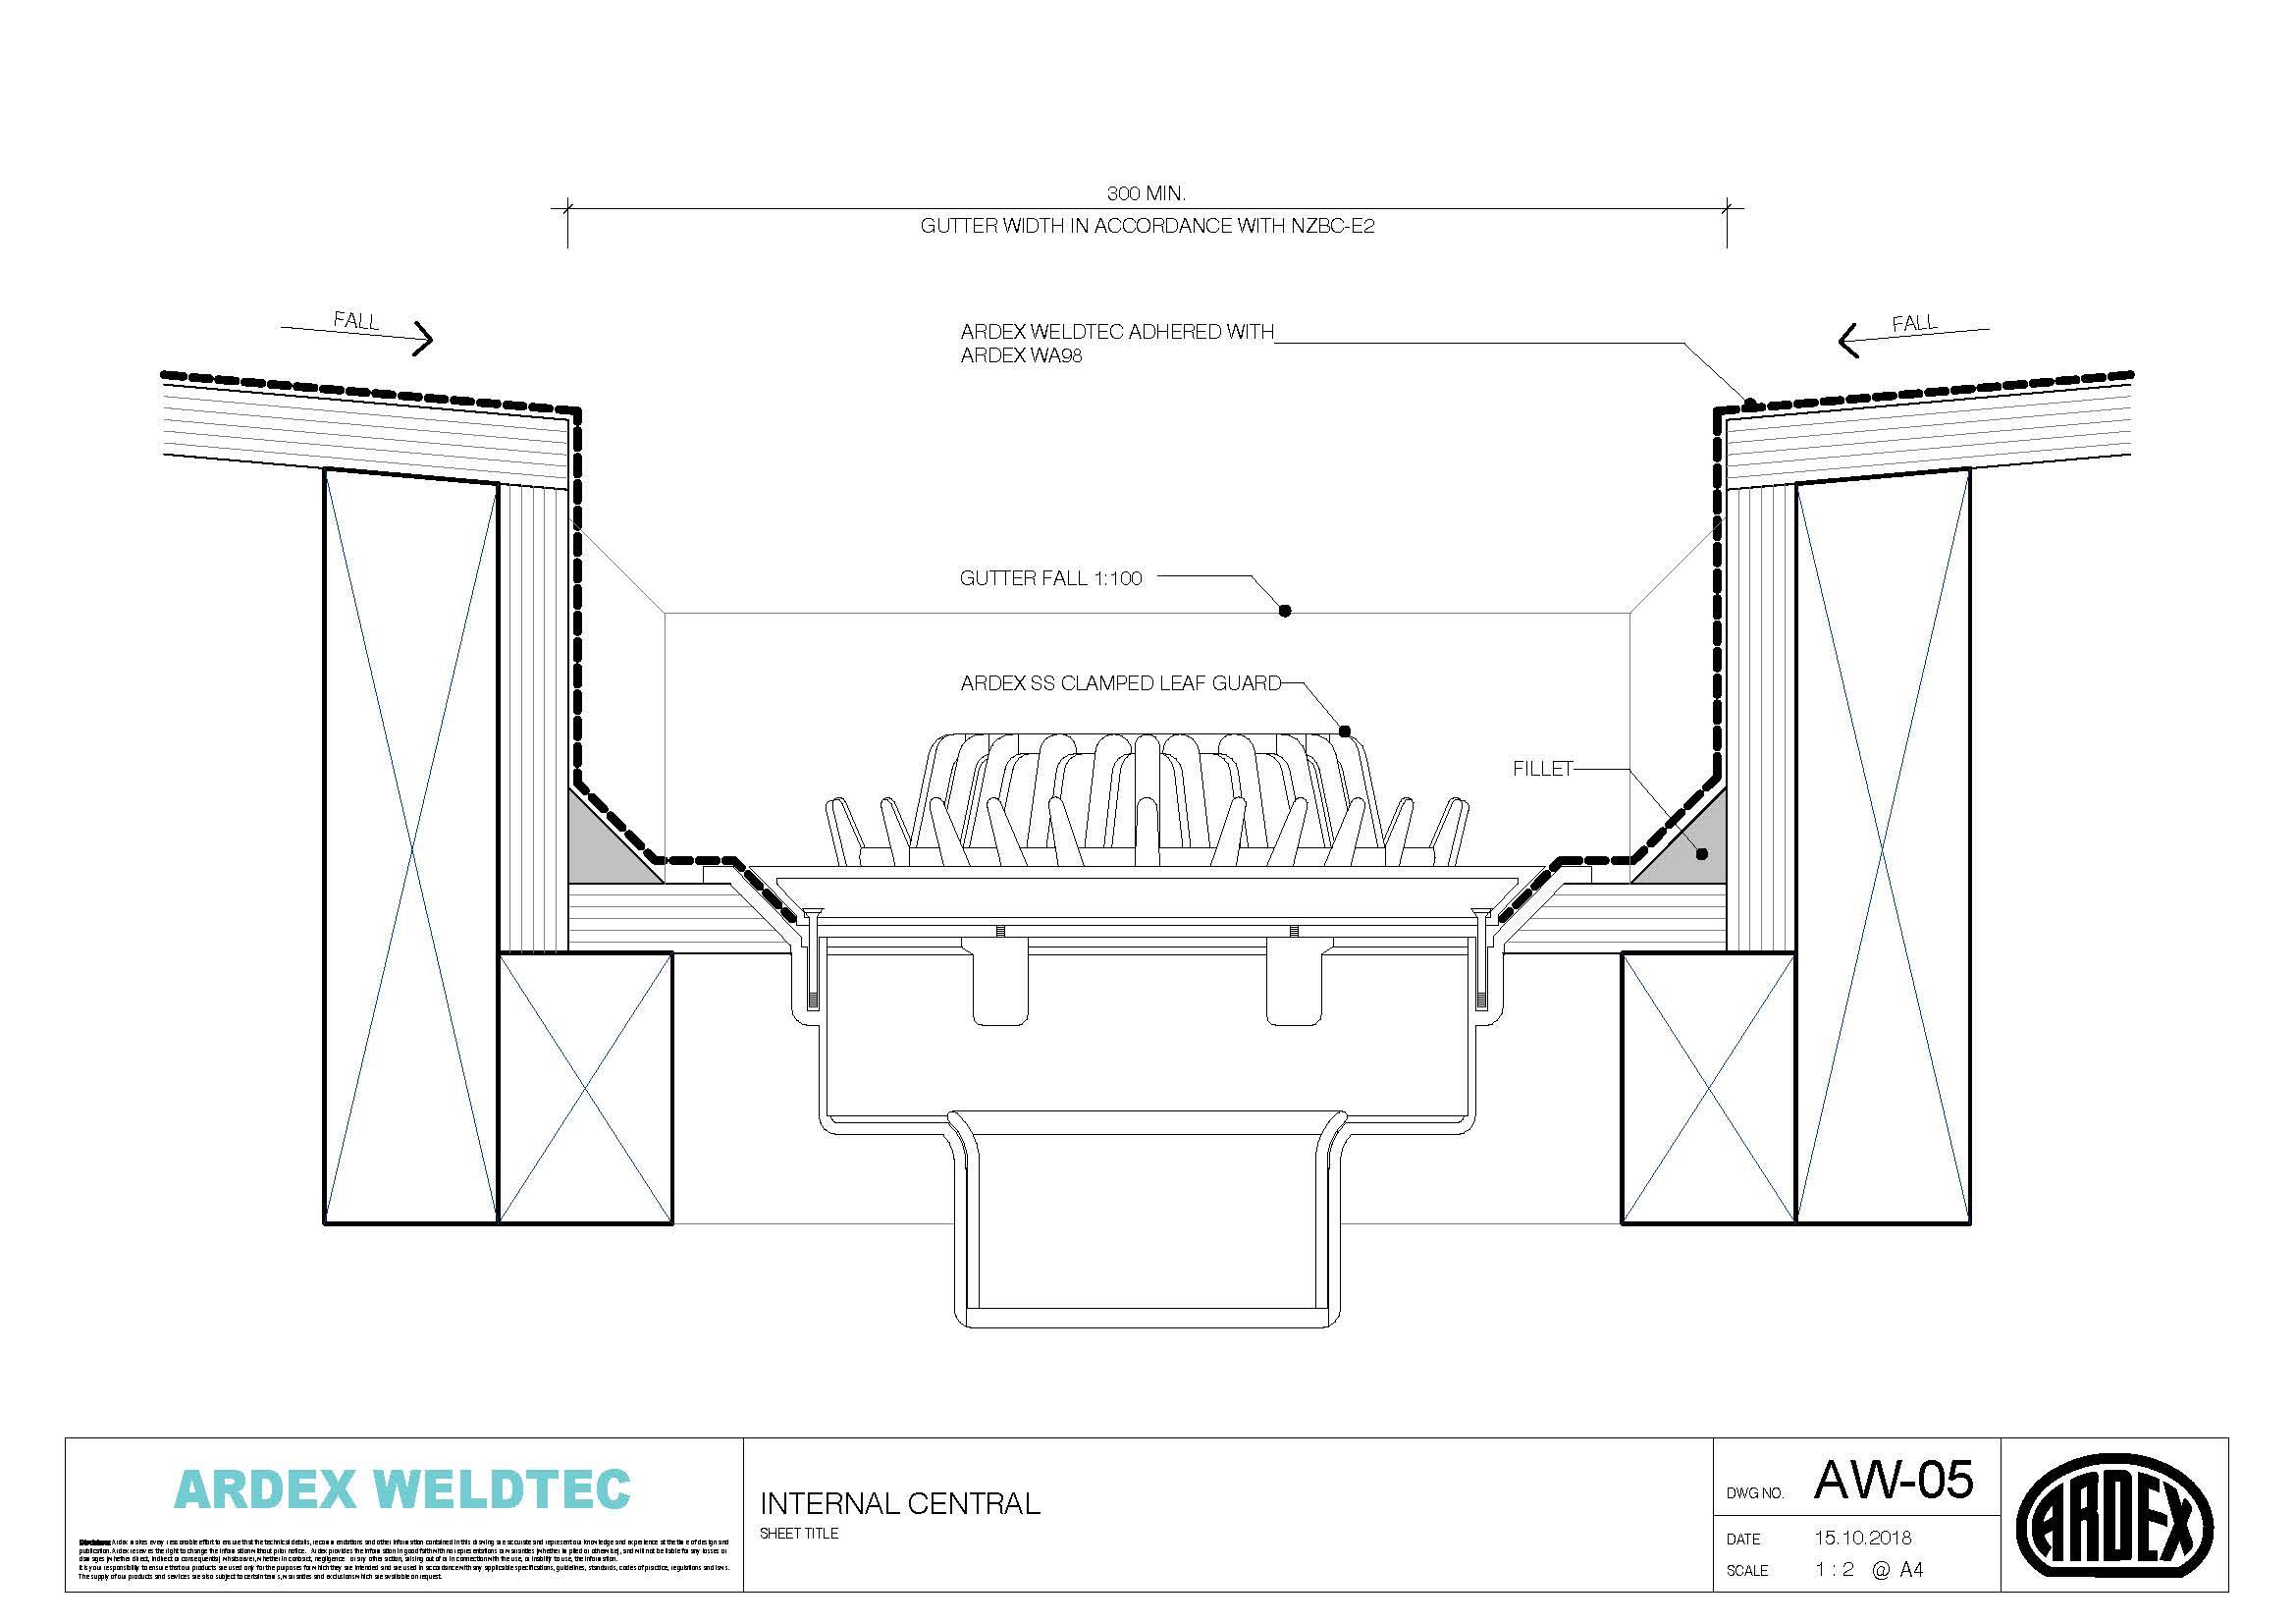 Weldtec internal central